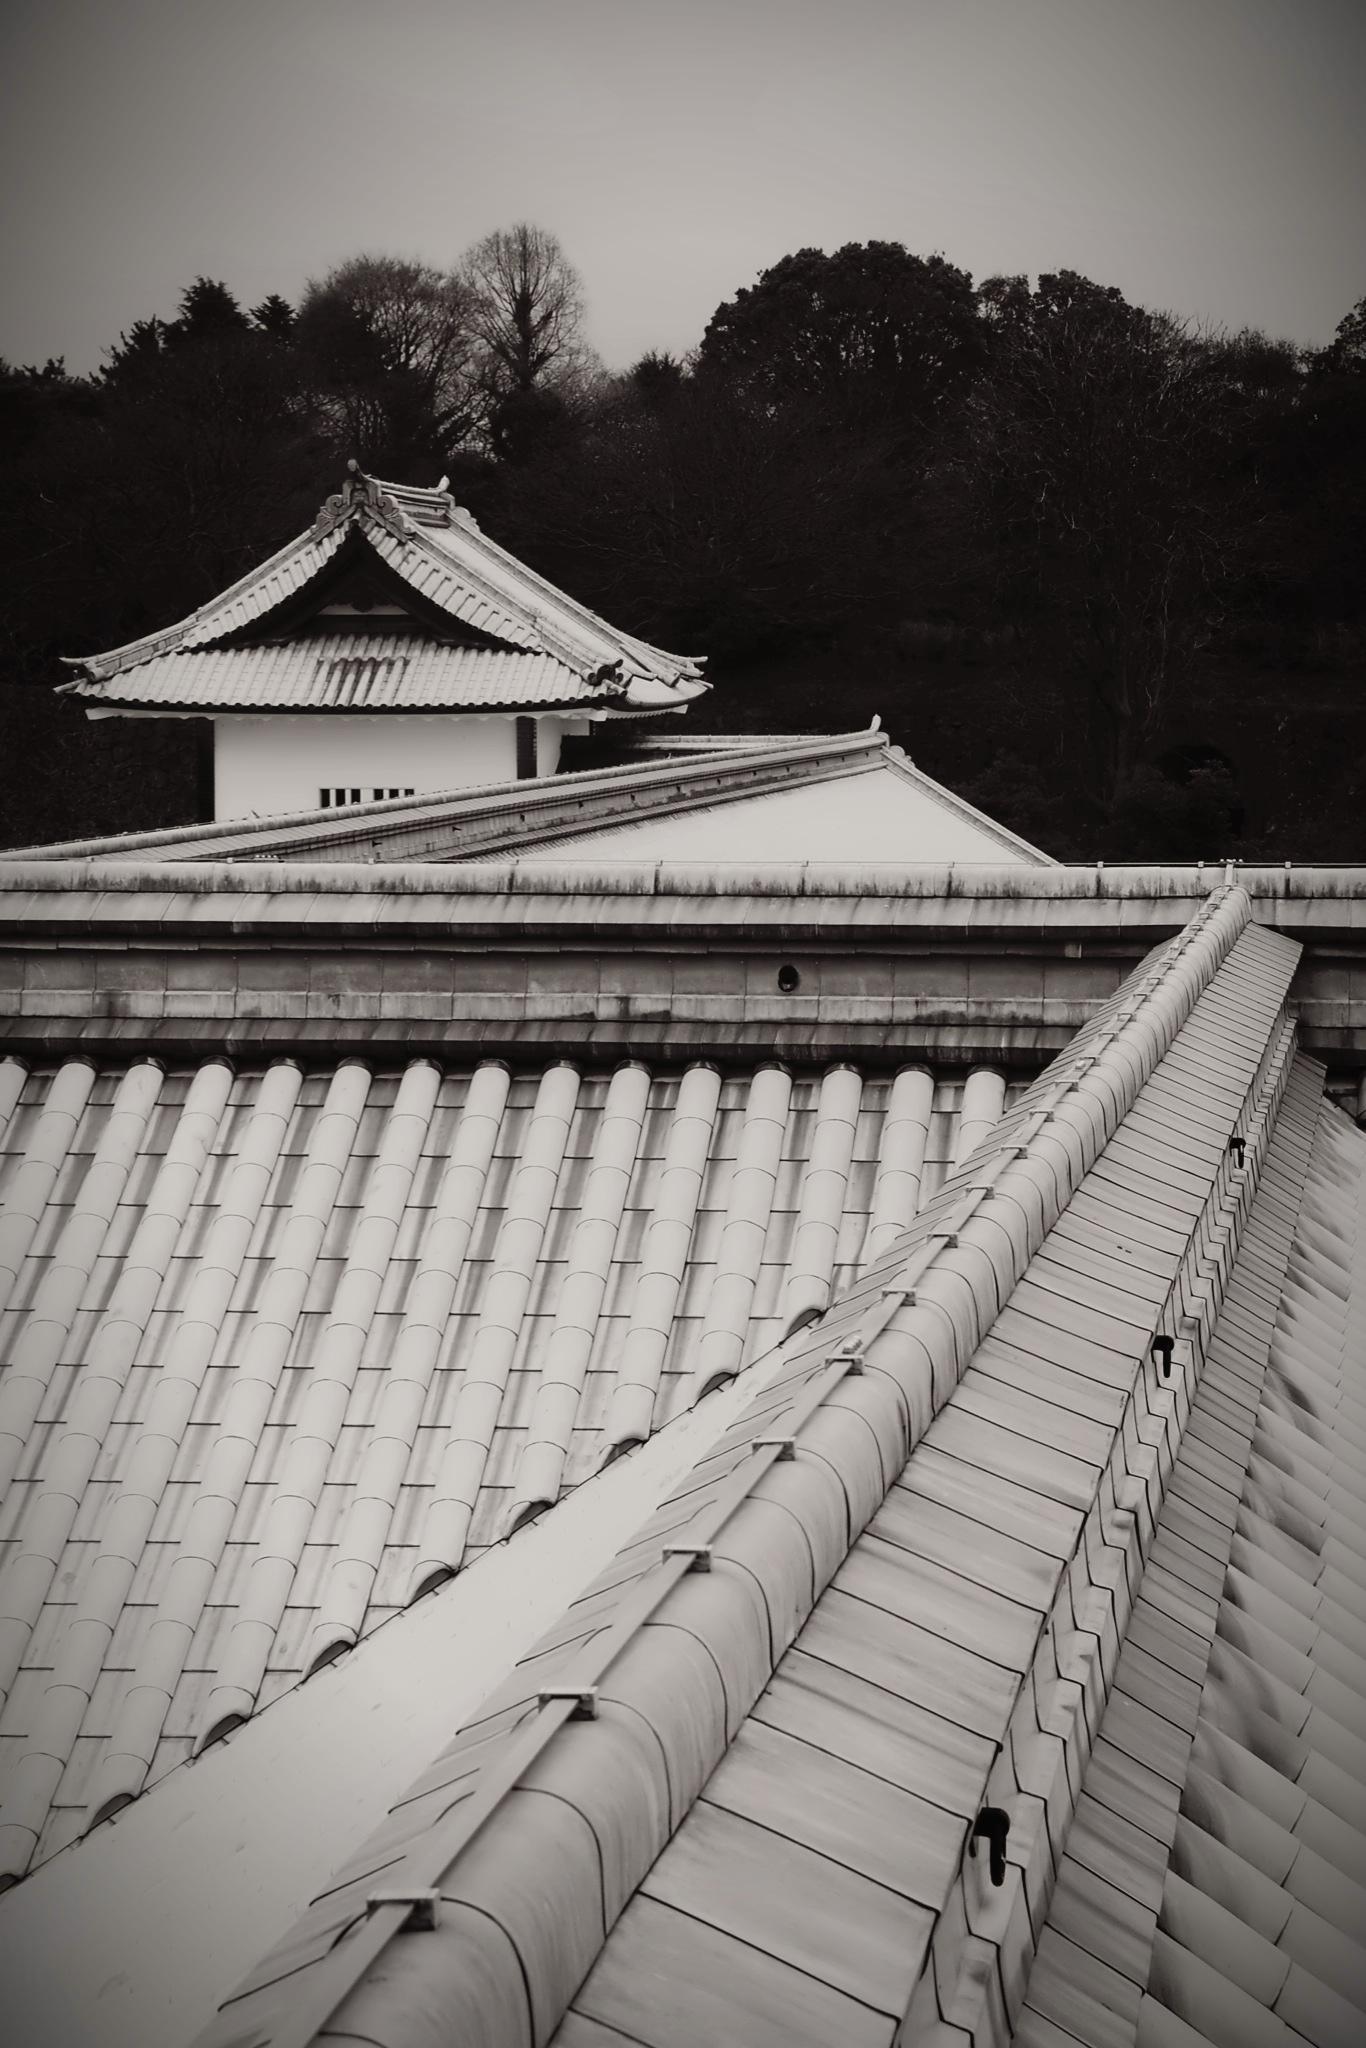 Lead Roof at Kanazawa Castle